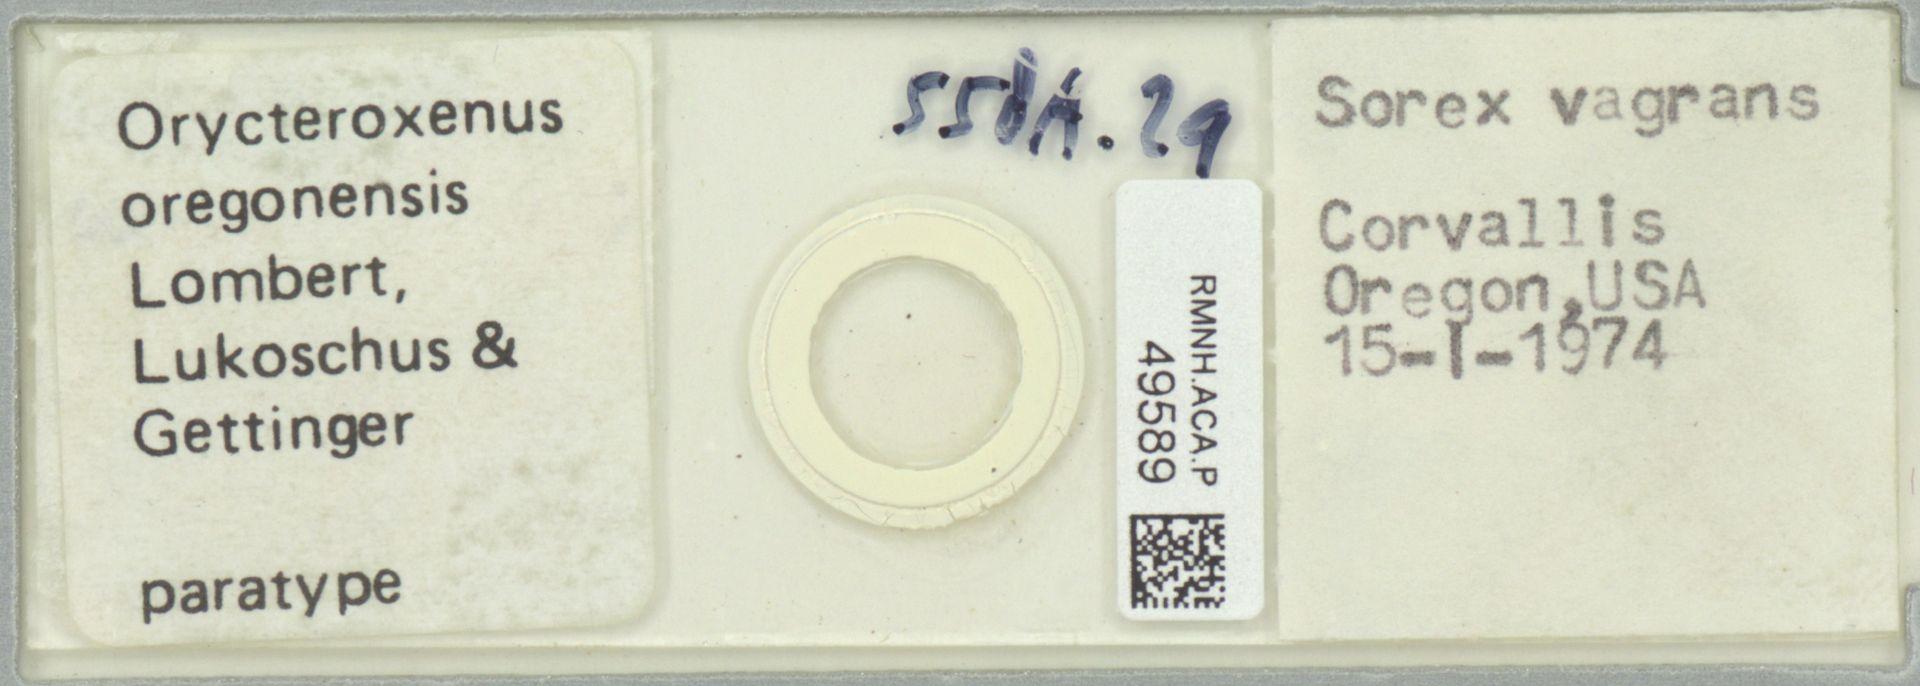 RMNH.ACA.P.49589 | Orycteroxenus oregonensis Lombert, Lukoschus & Gettinger